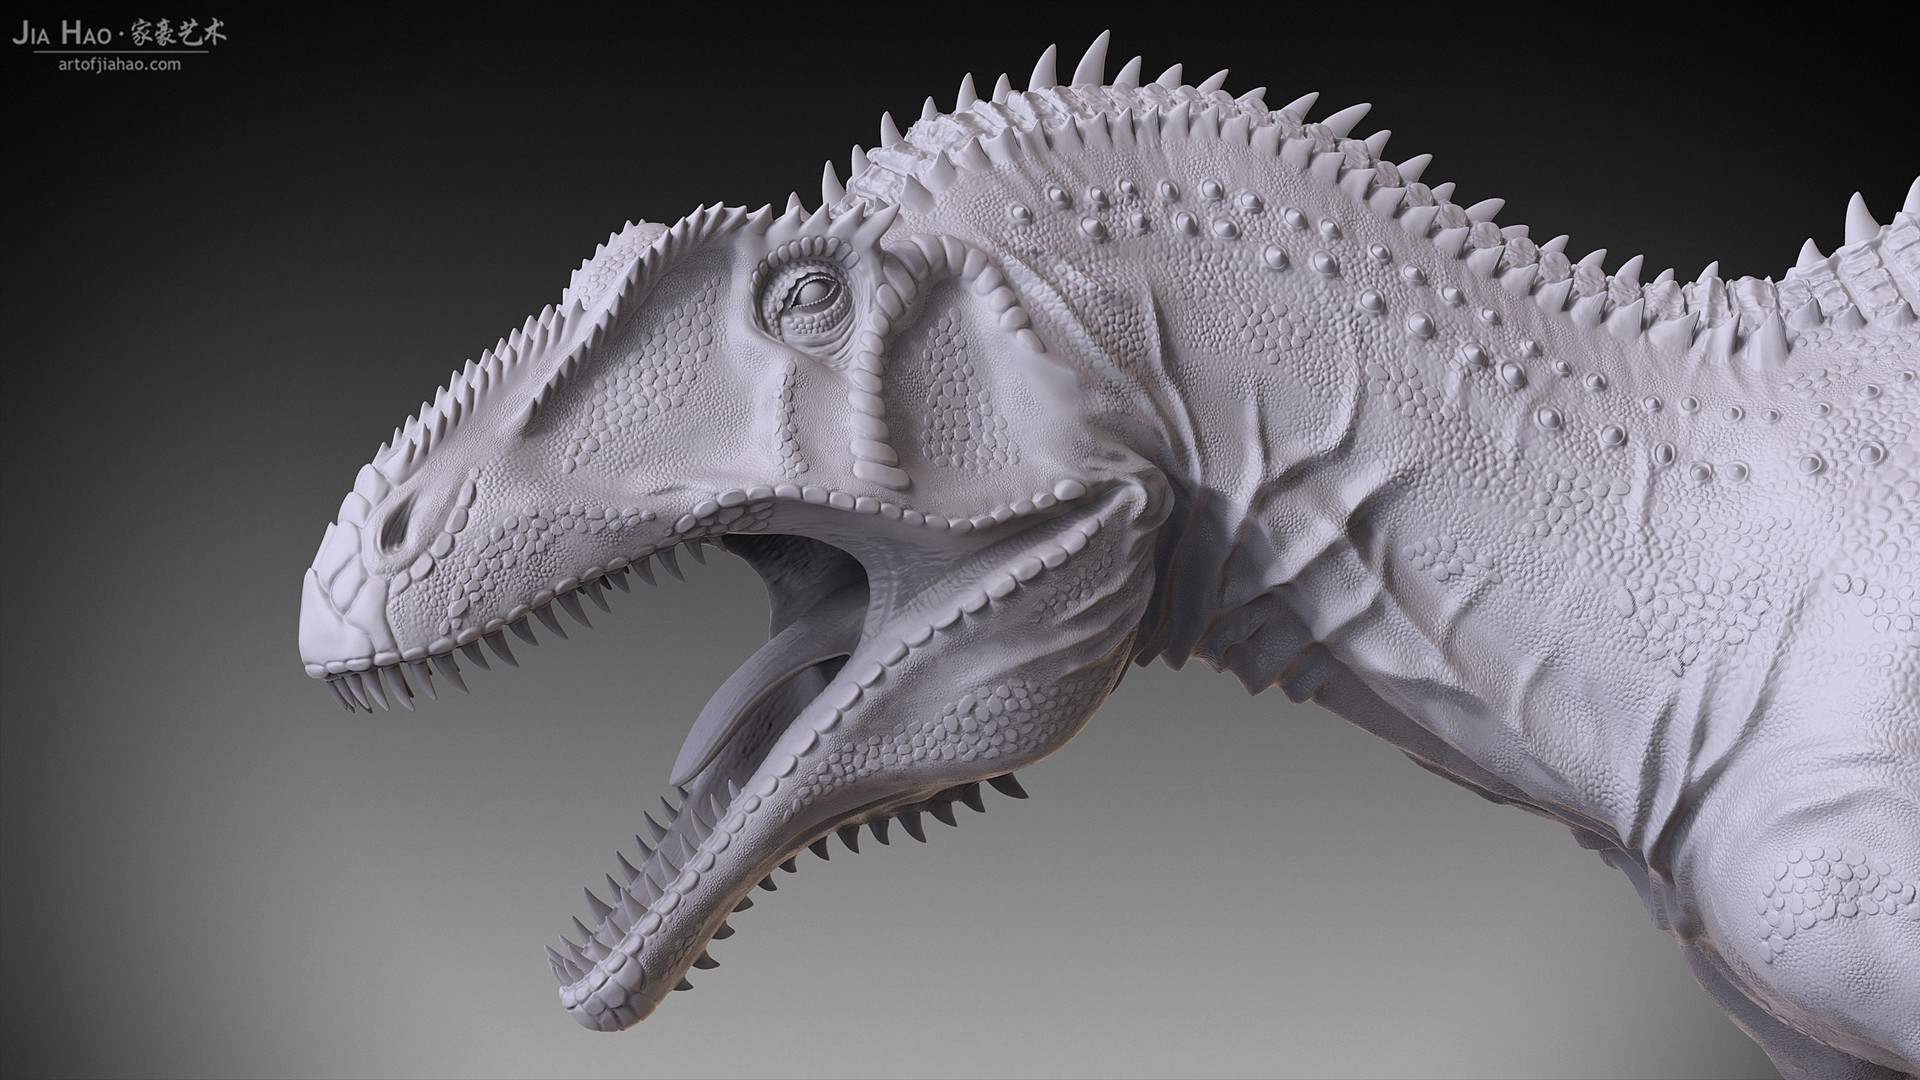 Jia hao acrocanthosaurus 05